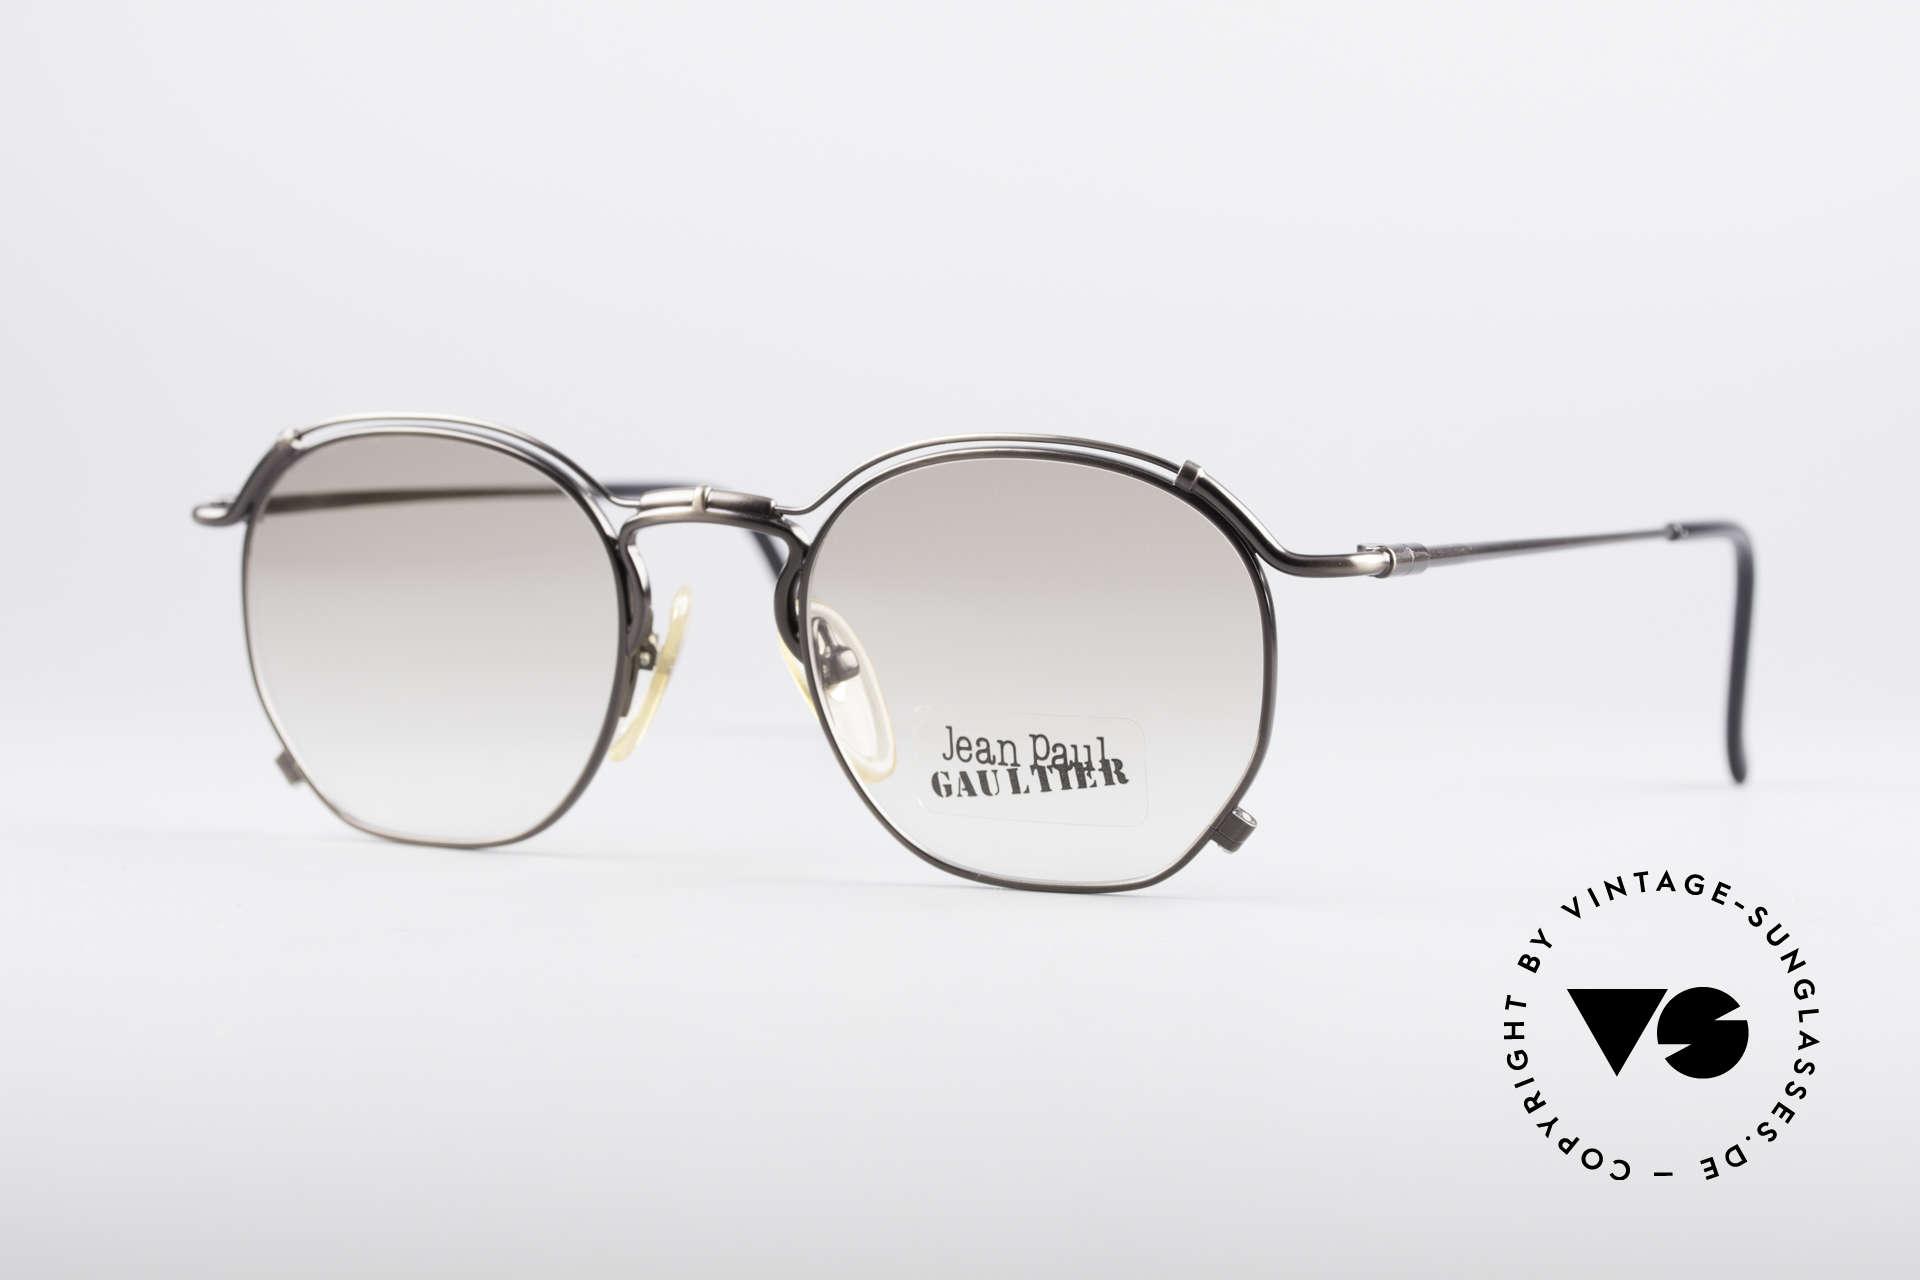 Jean Paul Gaultier 55-2171 90's Vintage JPG Frame, noble Jean Paul Gaultier 90's designer sunglasses, Made for Men and Women